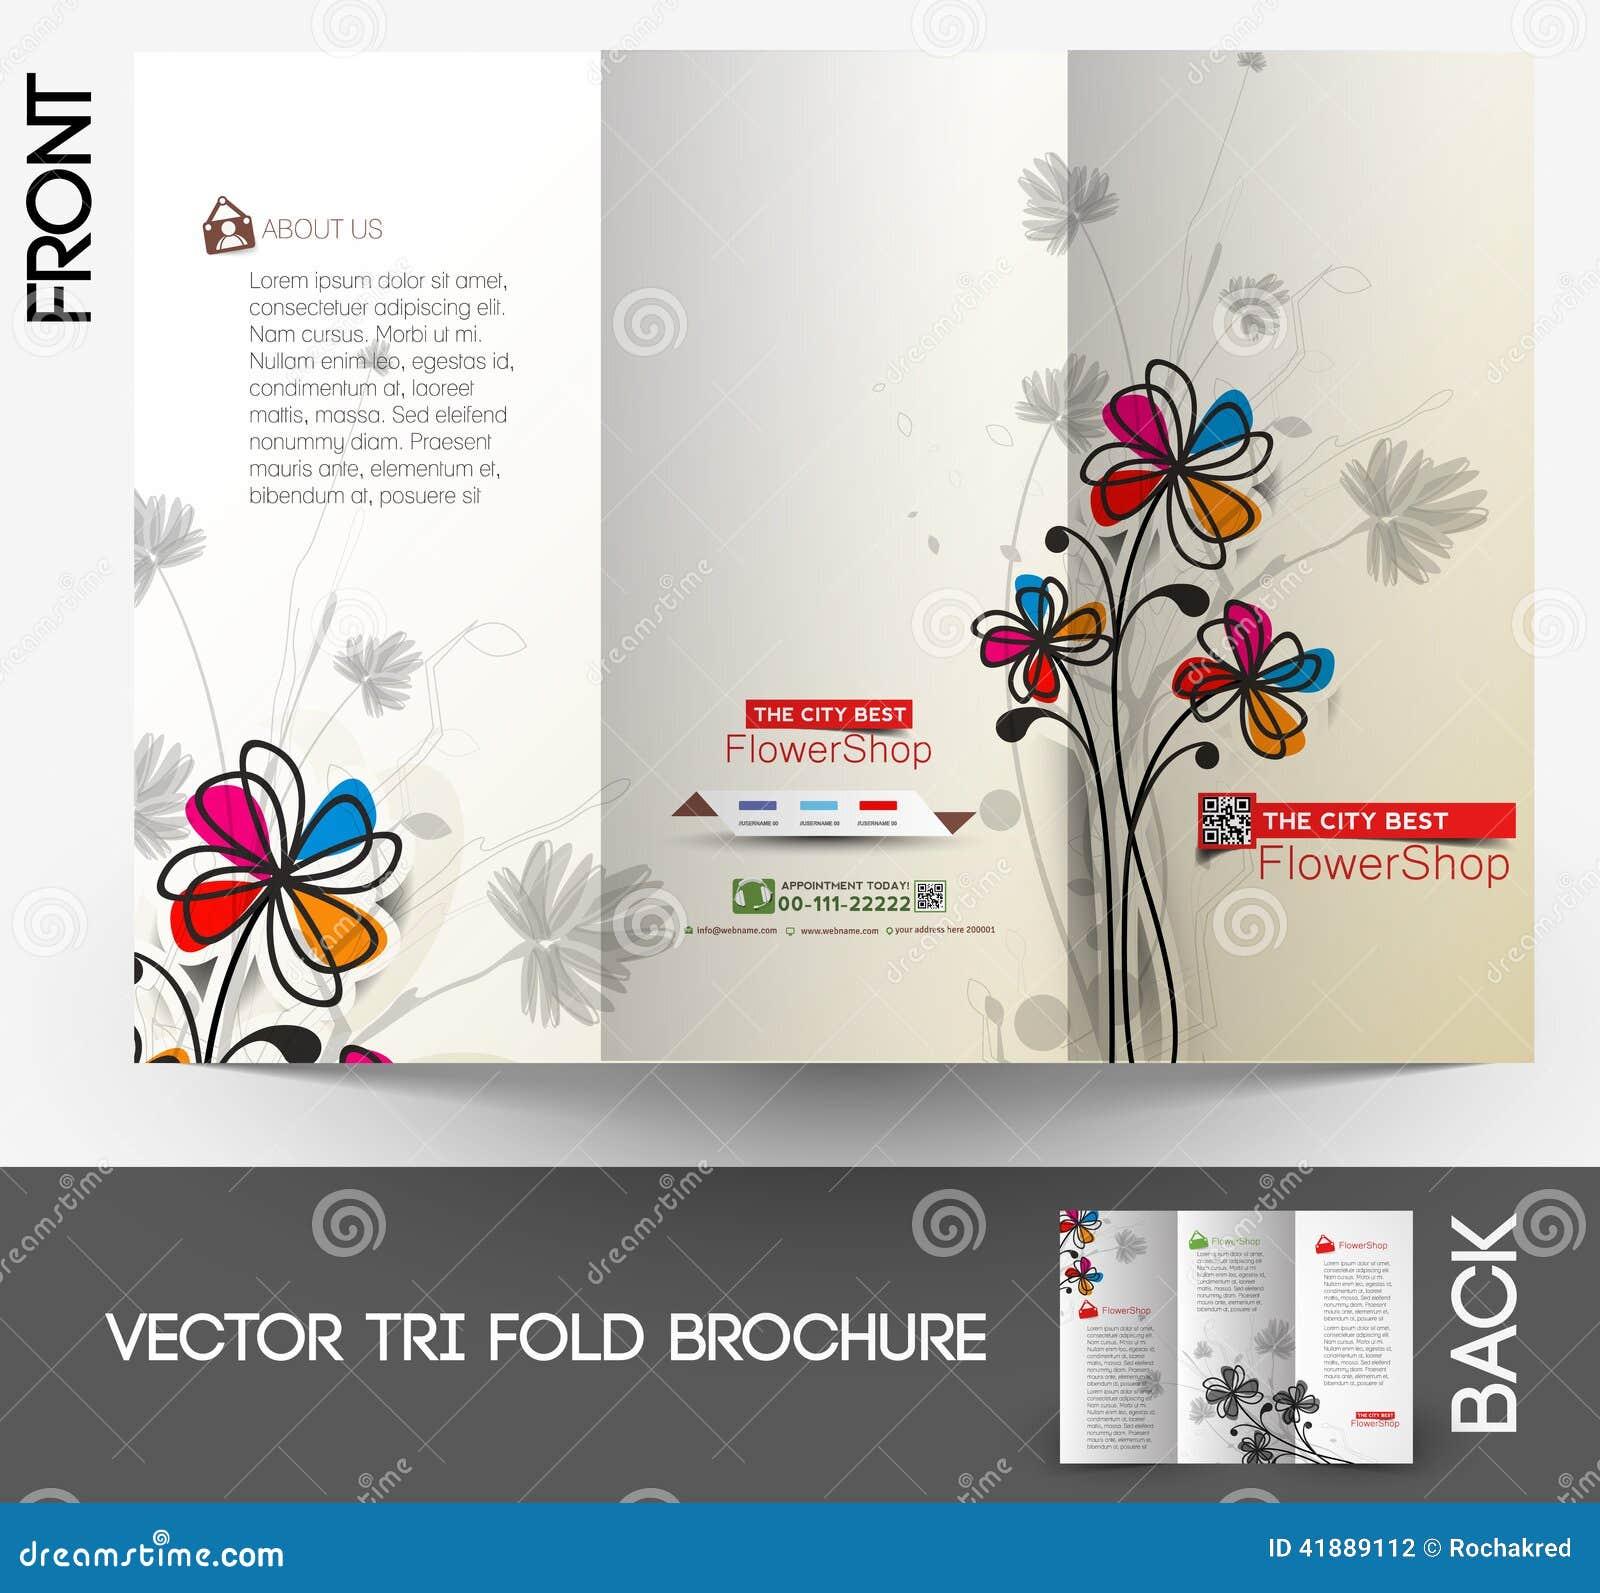 Flower shop Tri-Fold Brochure